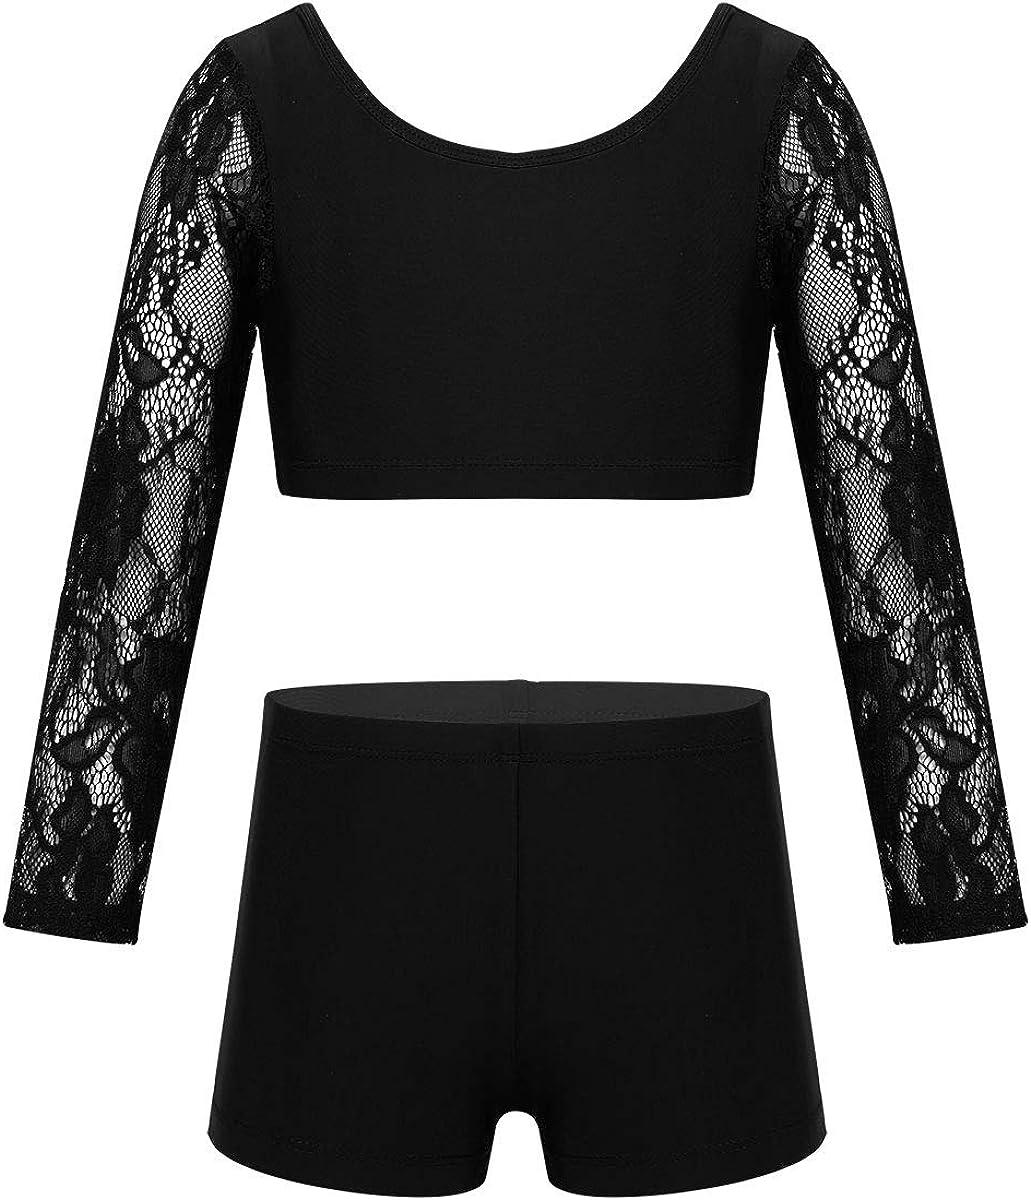 Girl Kids Dance Gym Dance Dress Gymnastics Leotard Crop Top+Shorts Dancewear Set